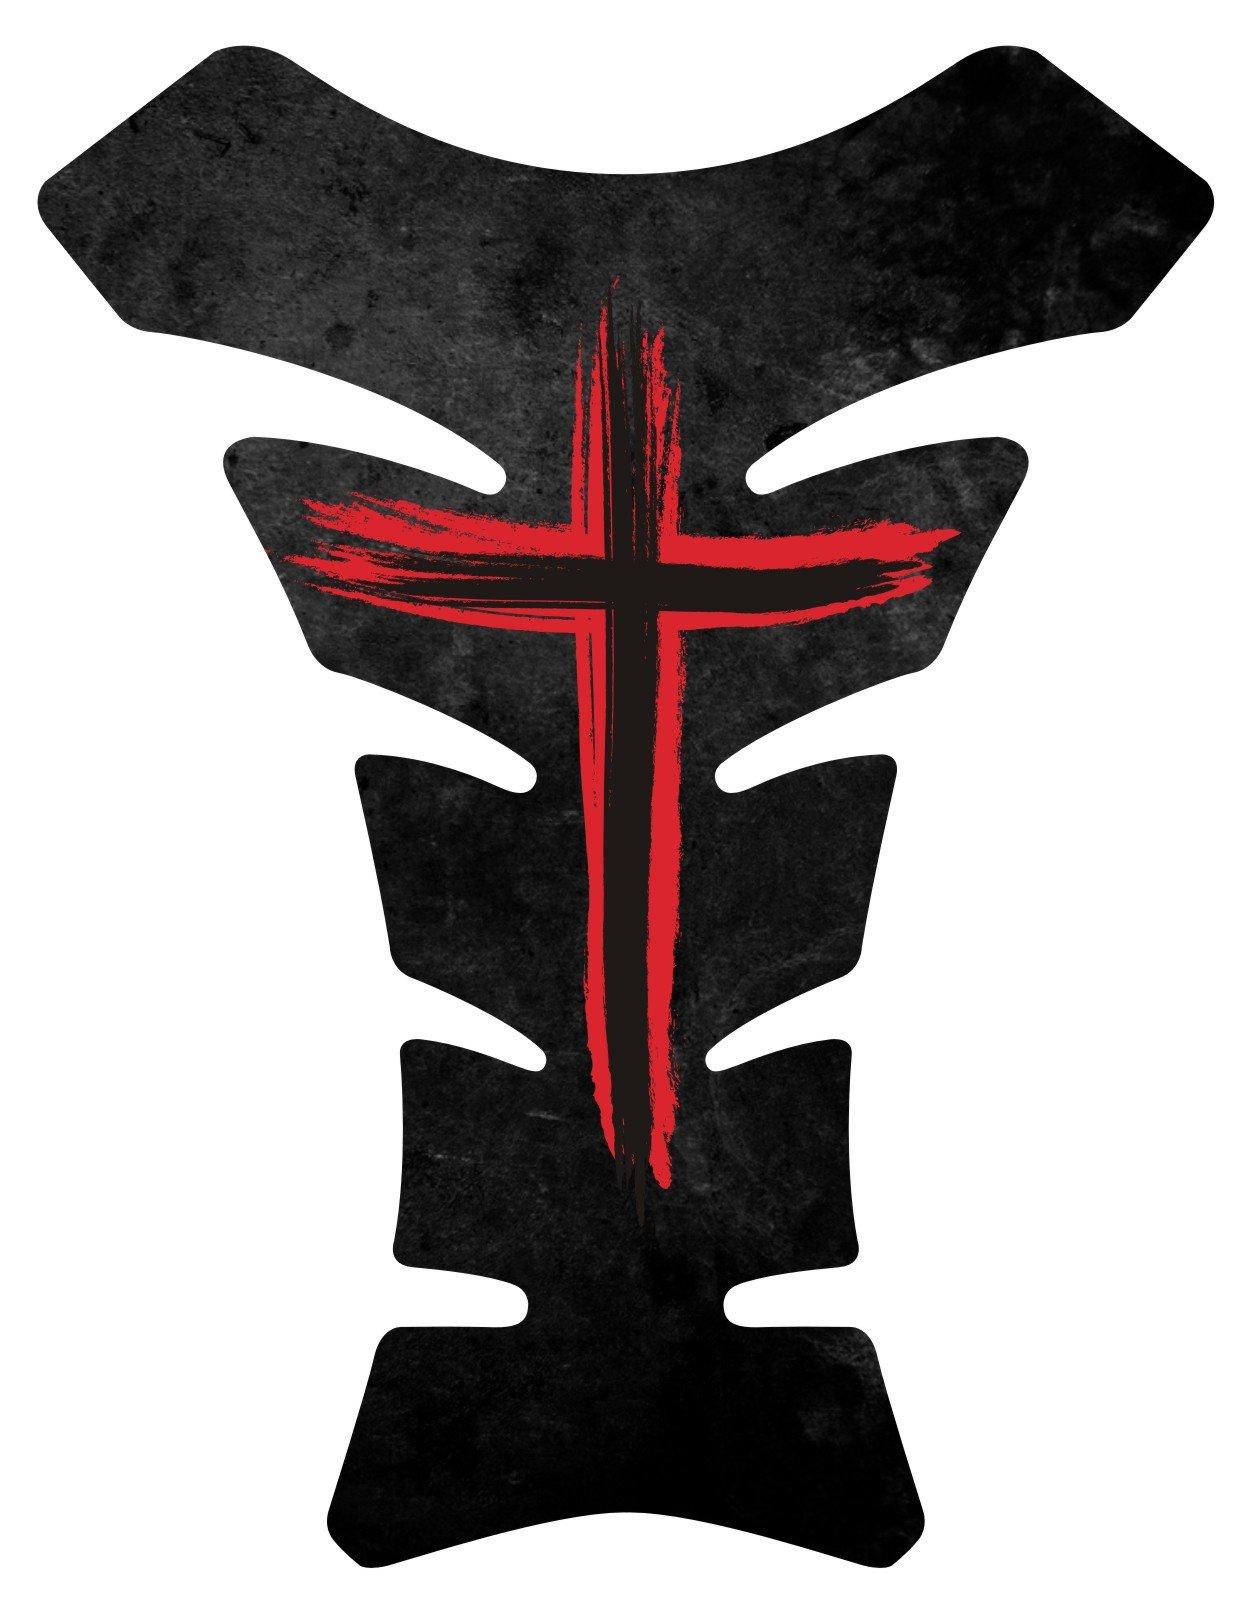 Size is 8.5 in tall x 6.5 in wide Jesus Christian Cross Black Red Gel Motorcycle Gas Tankpad Kawasaki Ninja ZX Suzuki GSXR Honda CBR Yamaha YZF Triumph Motorcycle TanK pad Decal Sticker